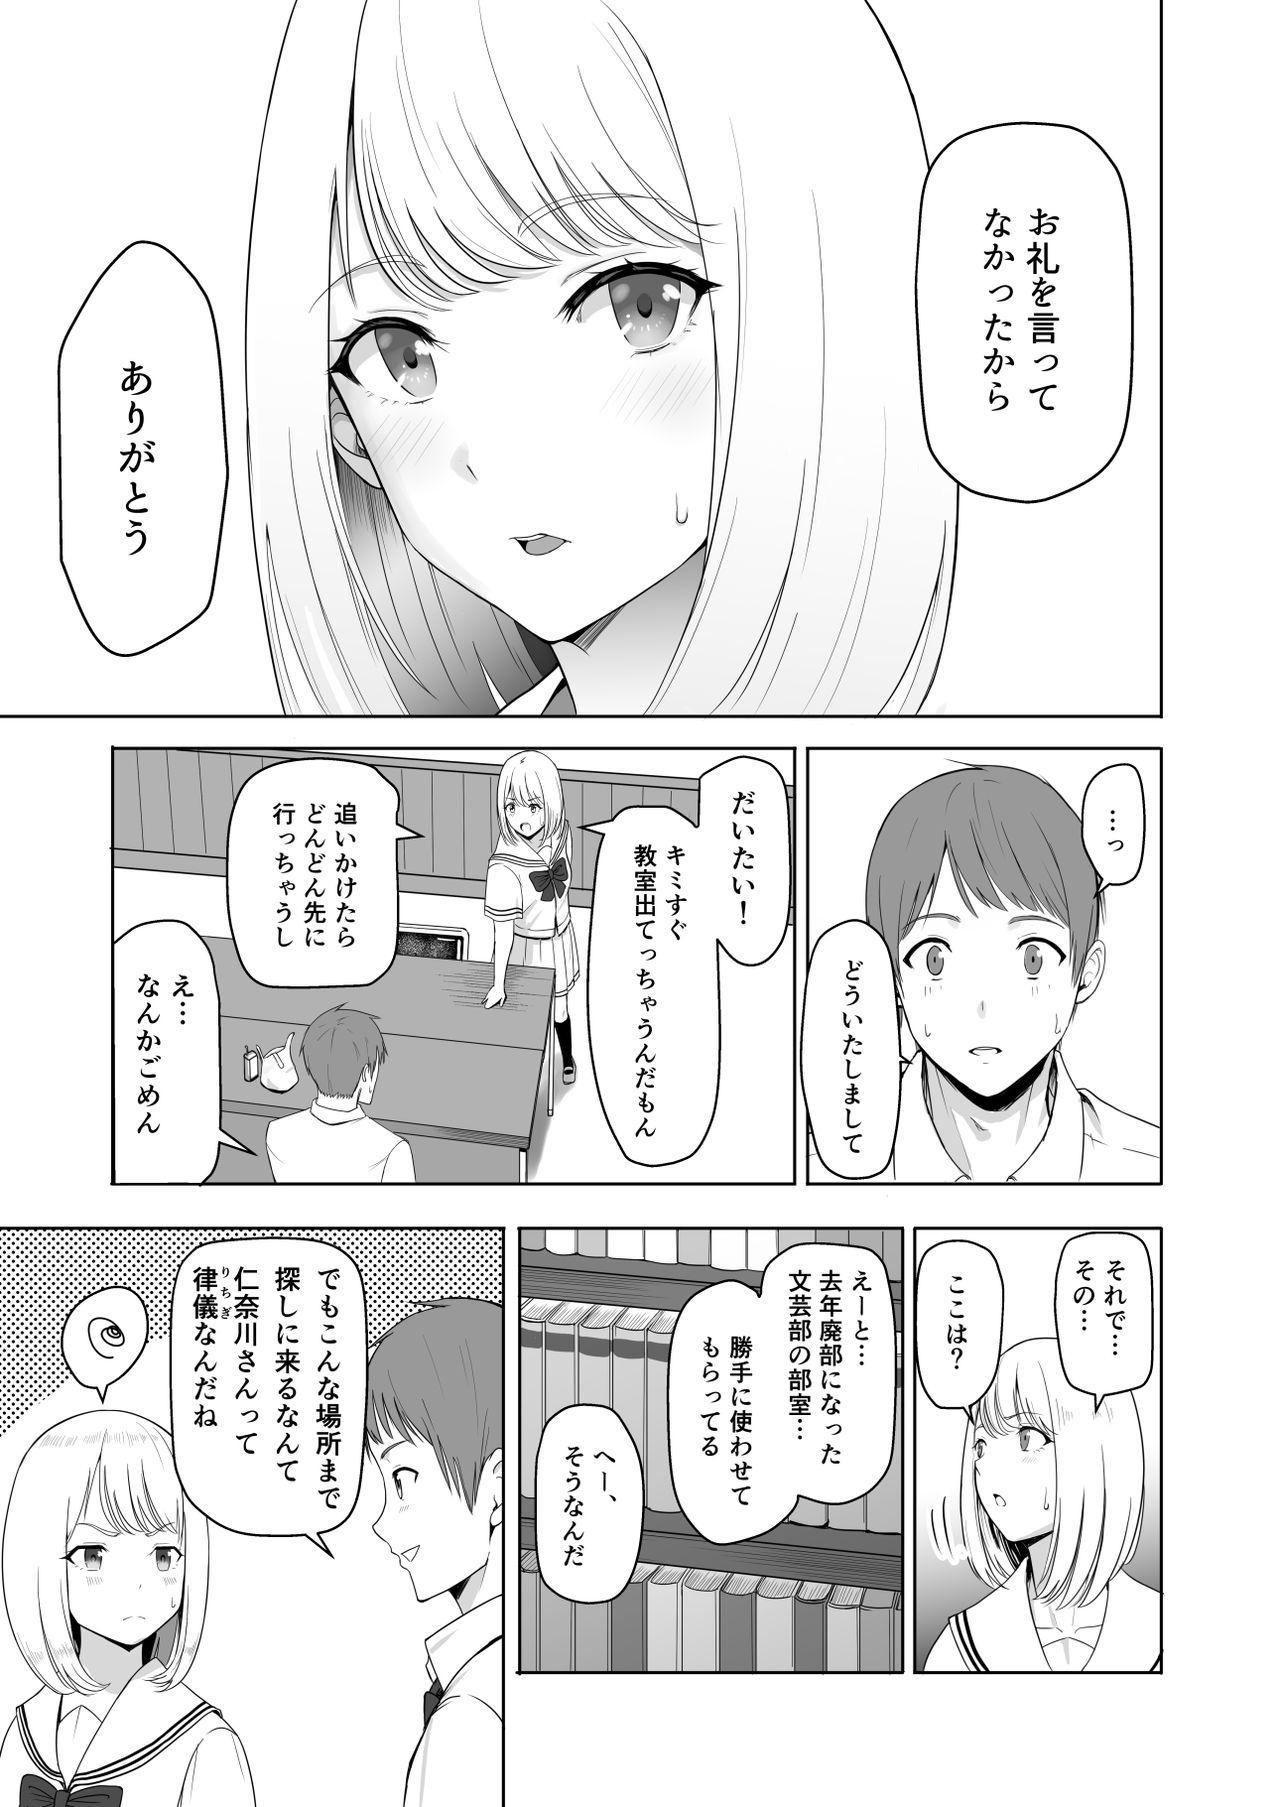 Kimi ga Tame. 2 Ichikawa Inori 19